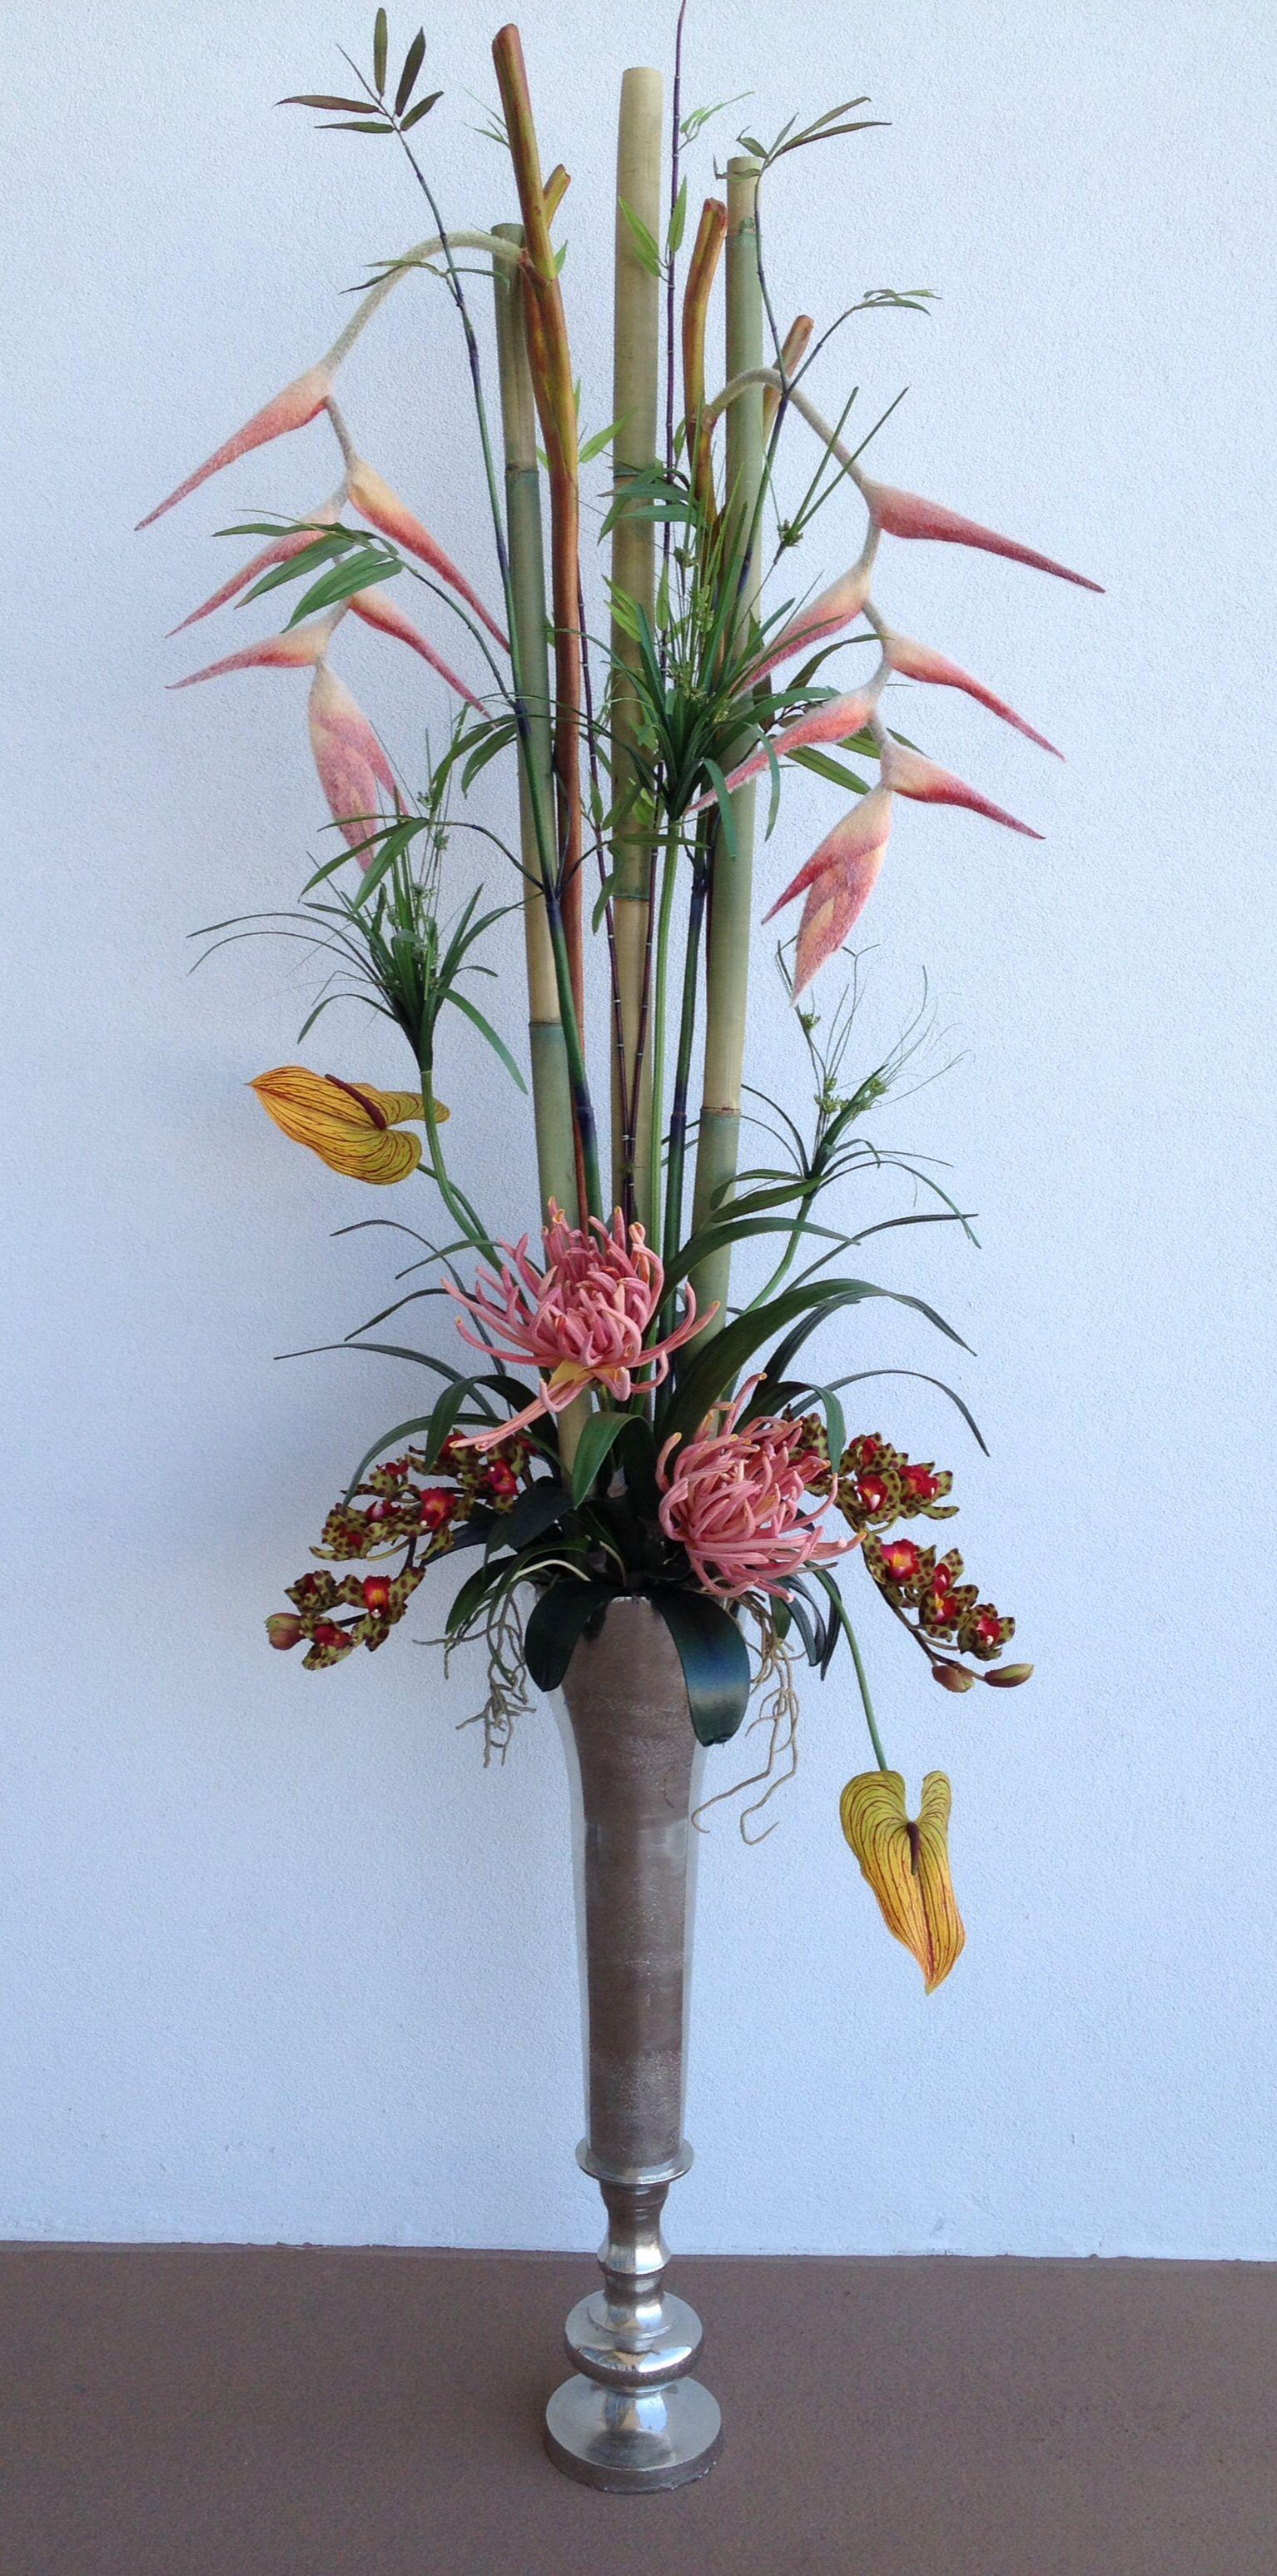 Silk Arrangements For Home Decor Designed By Arcadia Floral Home Decor 8ft Structured Design Of